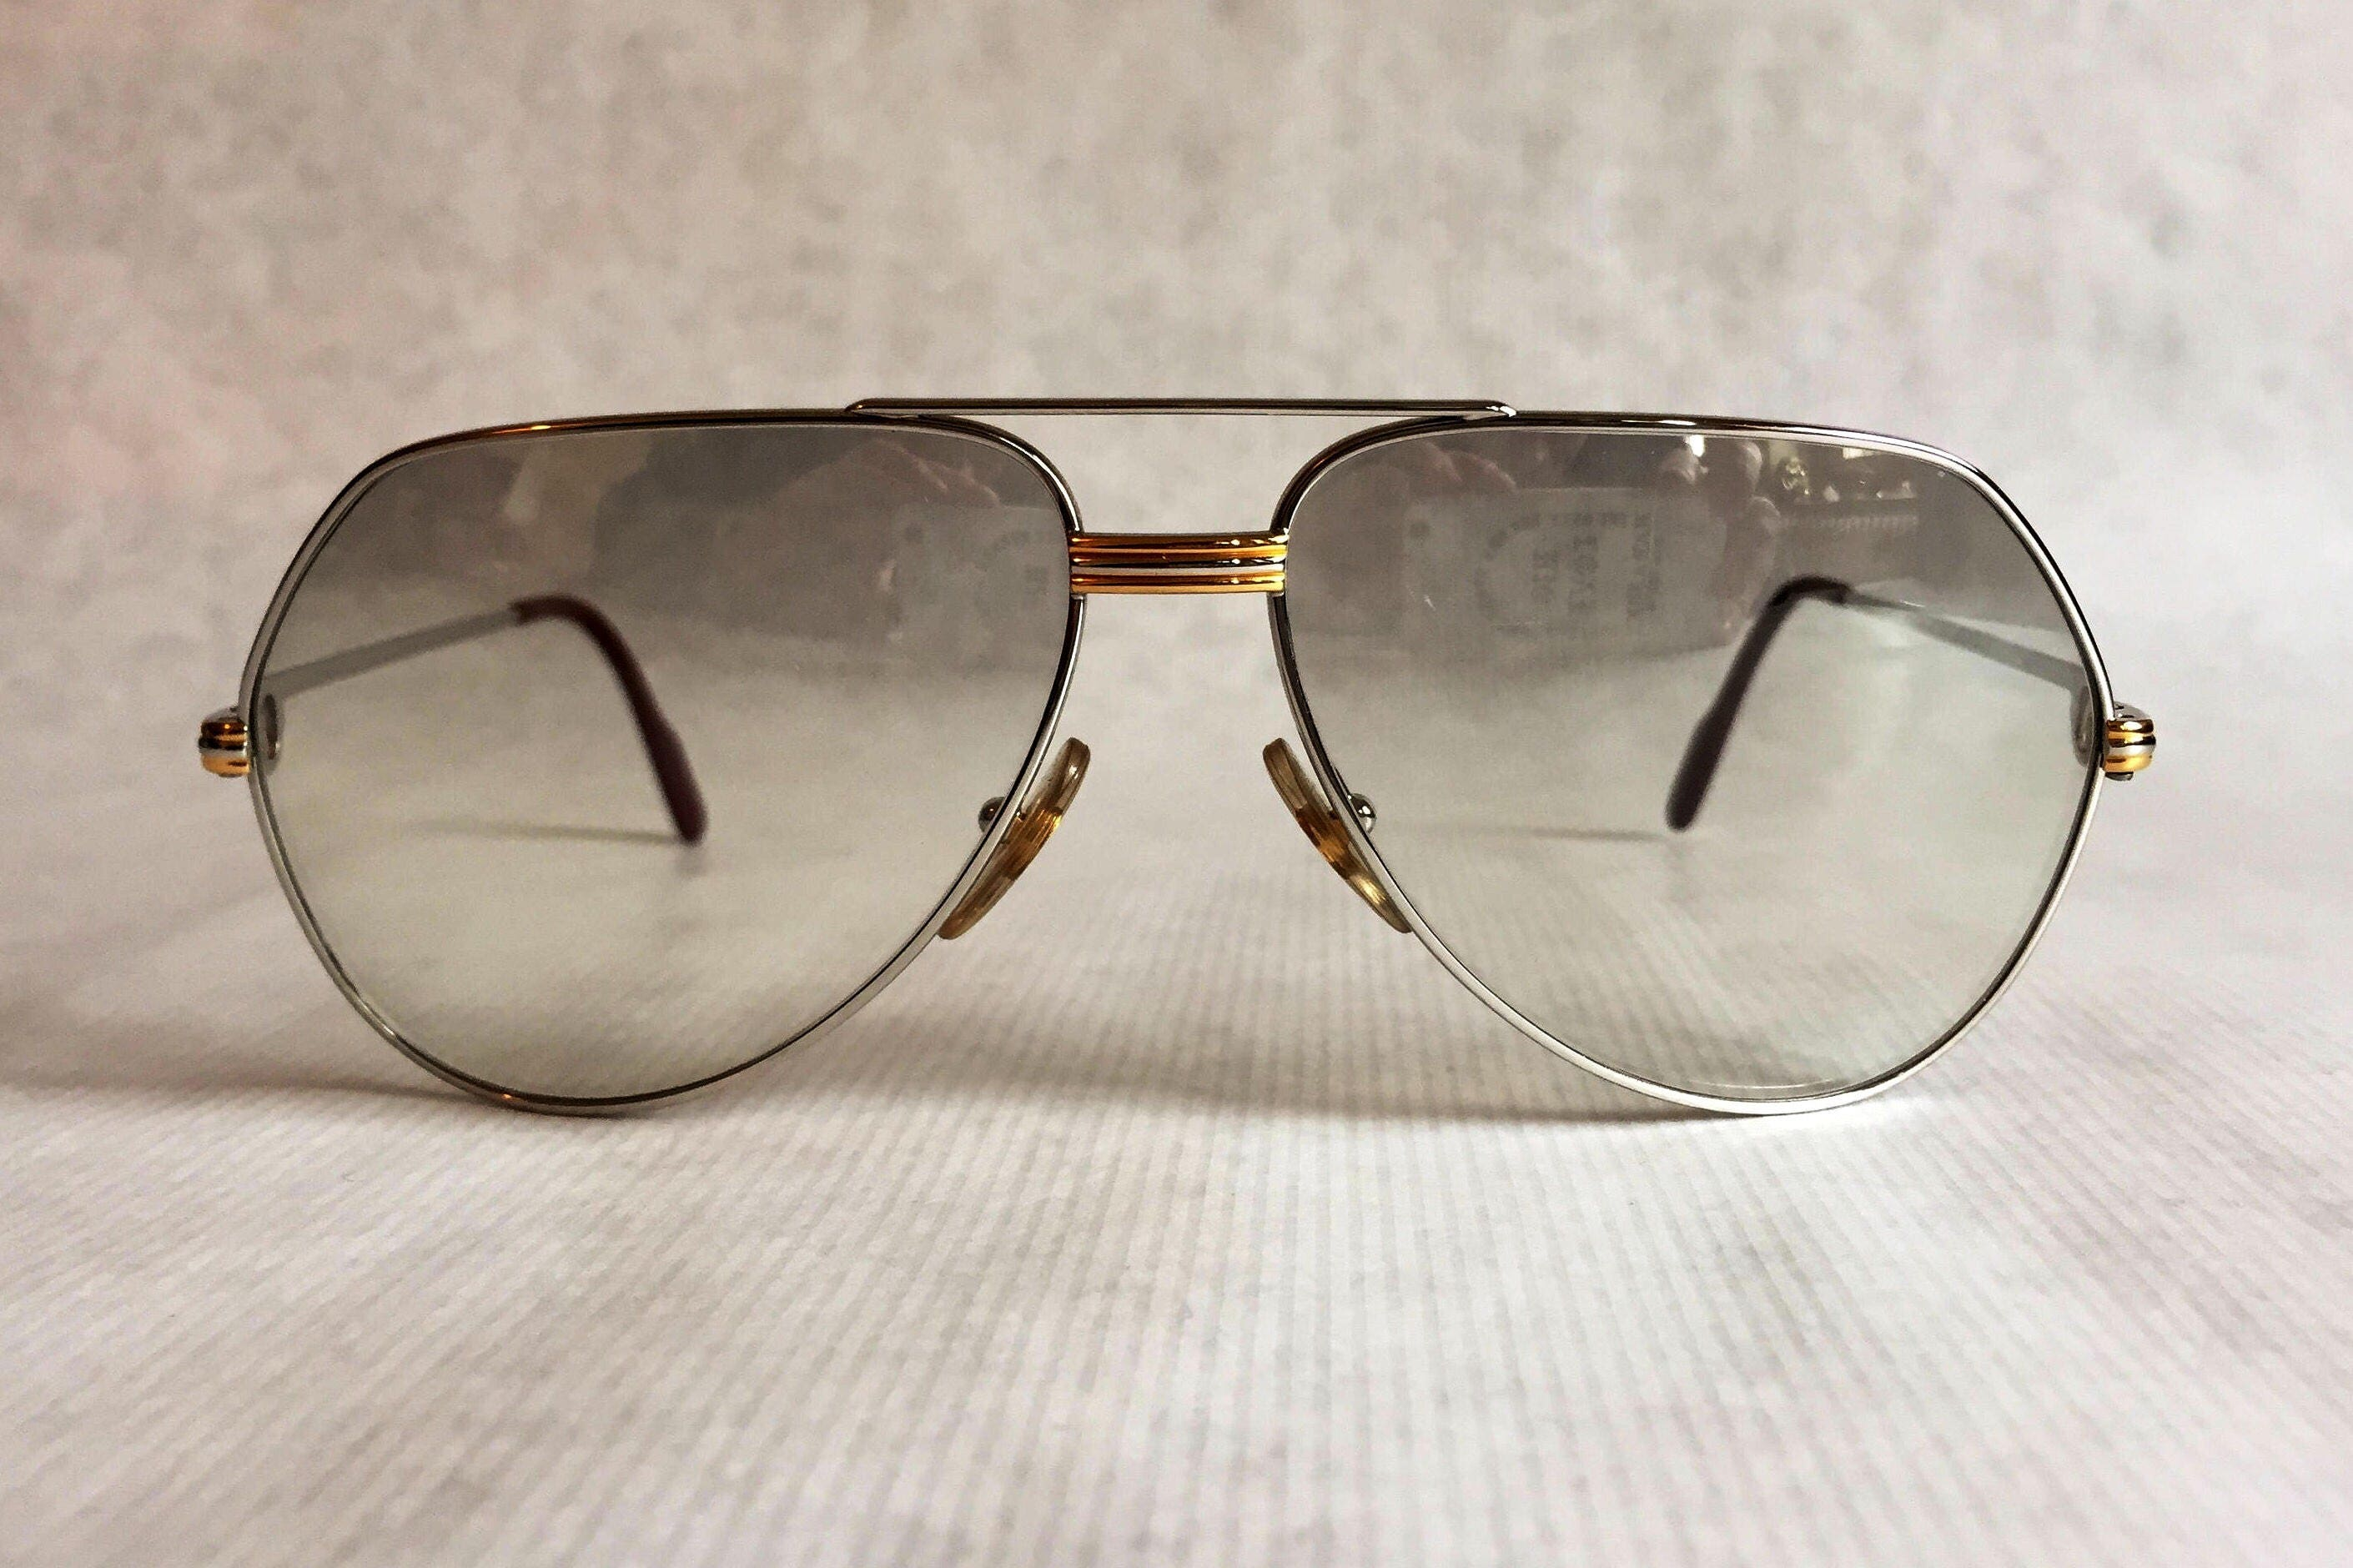 0a32686034 1983 Cartier Vendôme Platinum Vintage Sunglasses Full Set New Old Stock